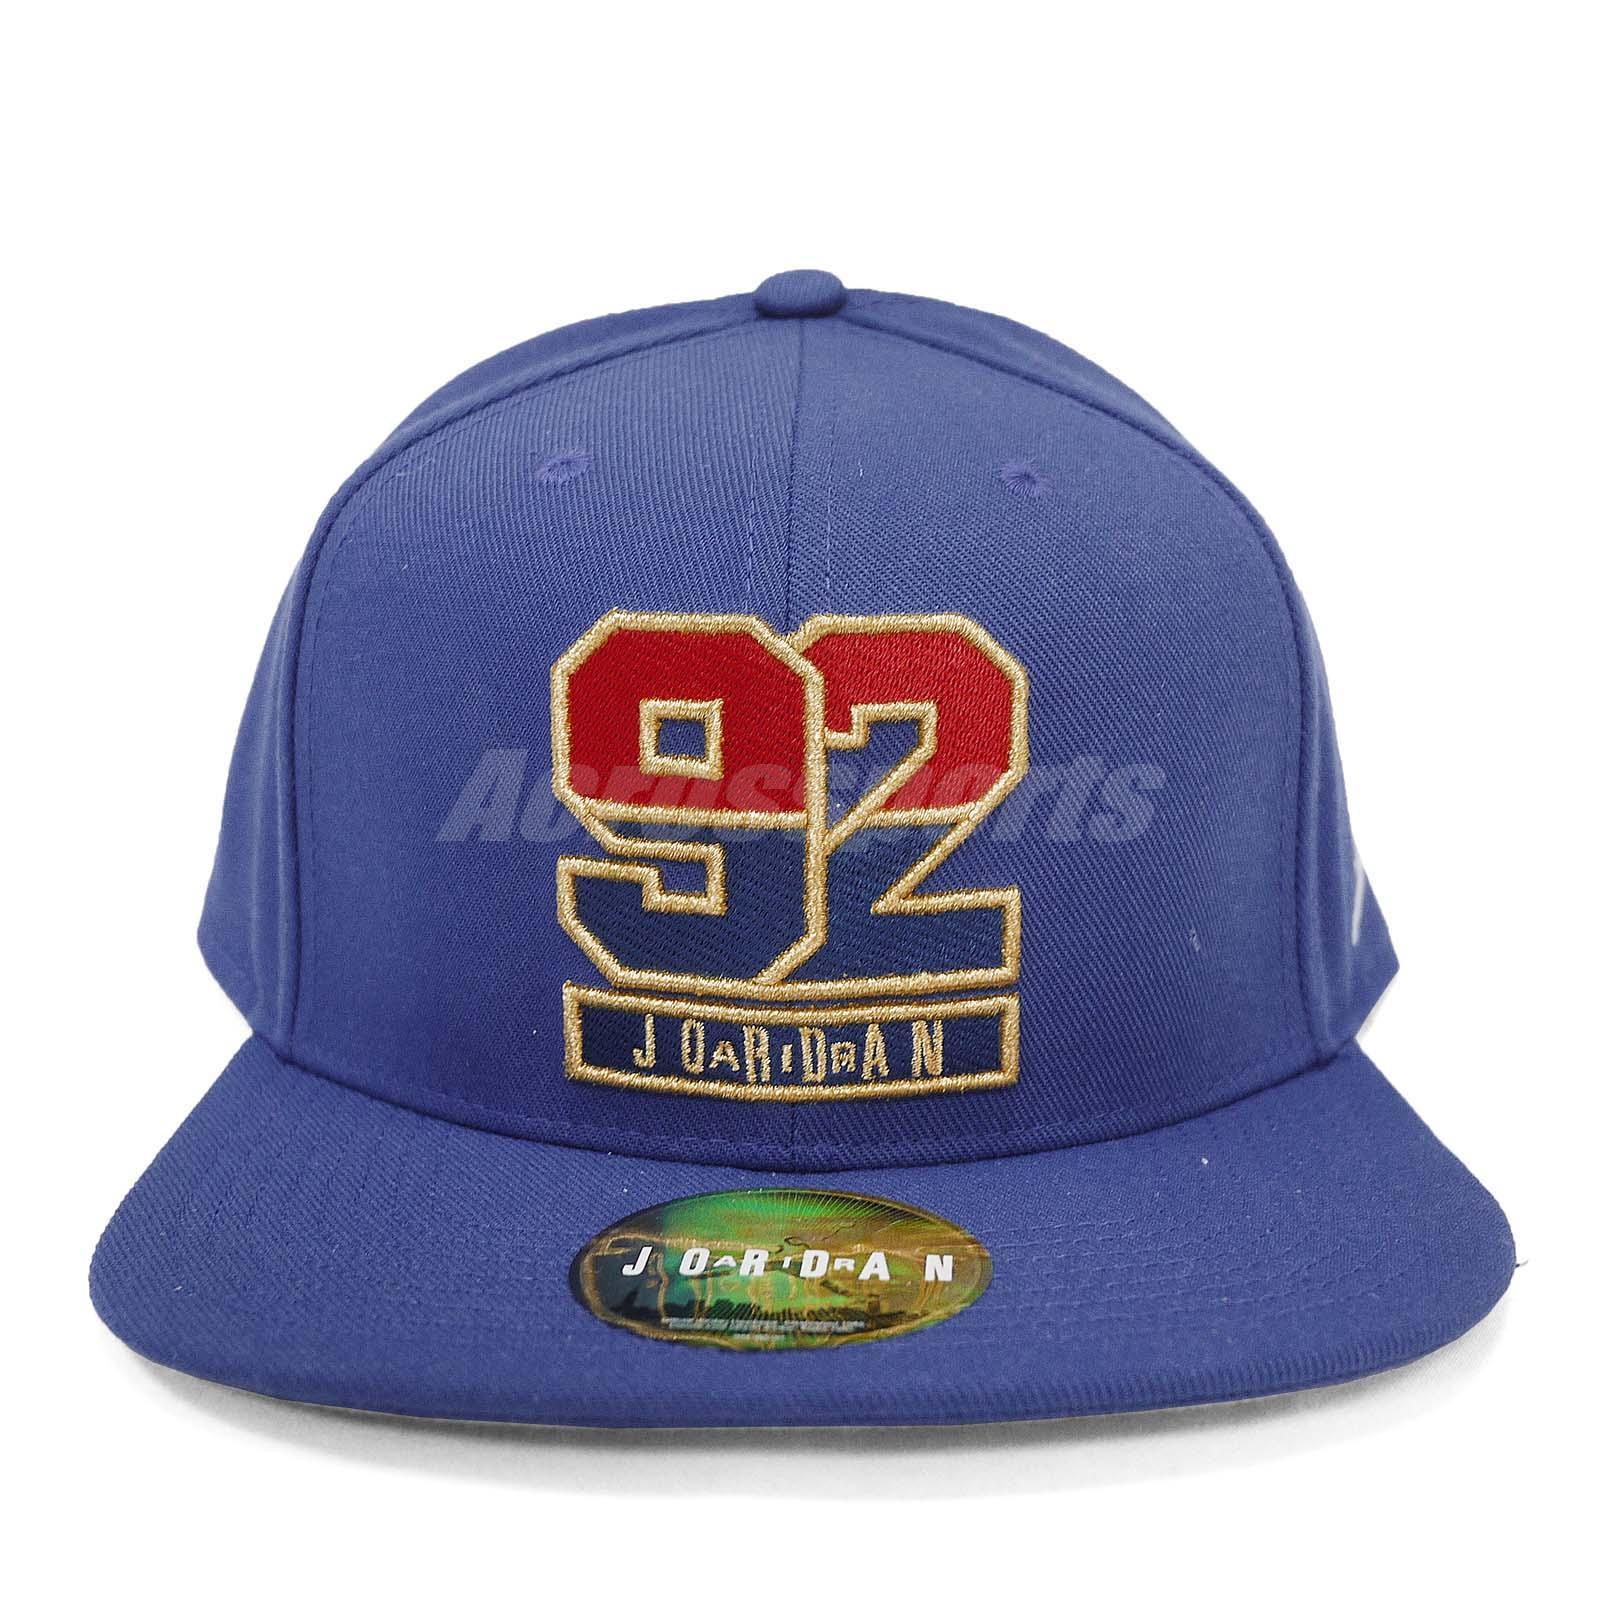 a84f7e87b97 Nike Air Jordan AJ 7 1992 USA Dream Team Adjustable Hat Cap Snapback ...